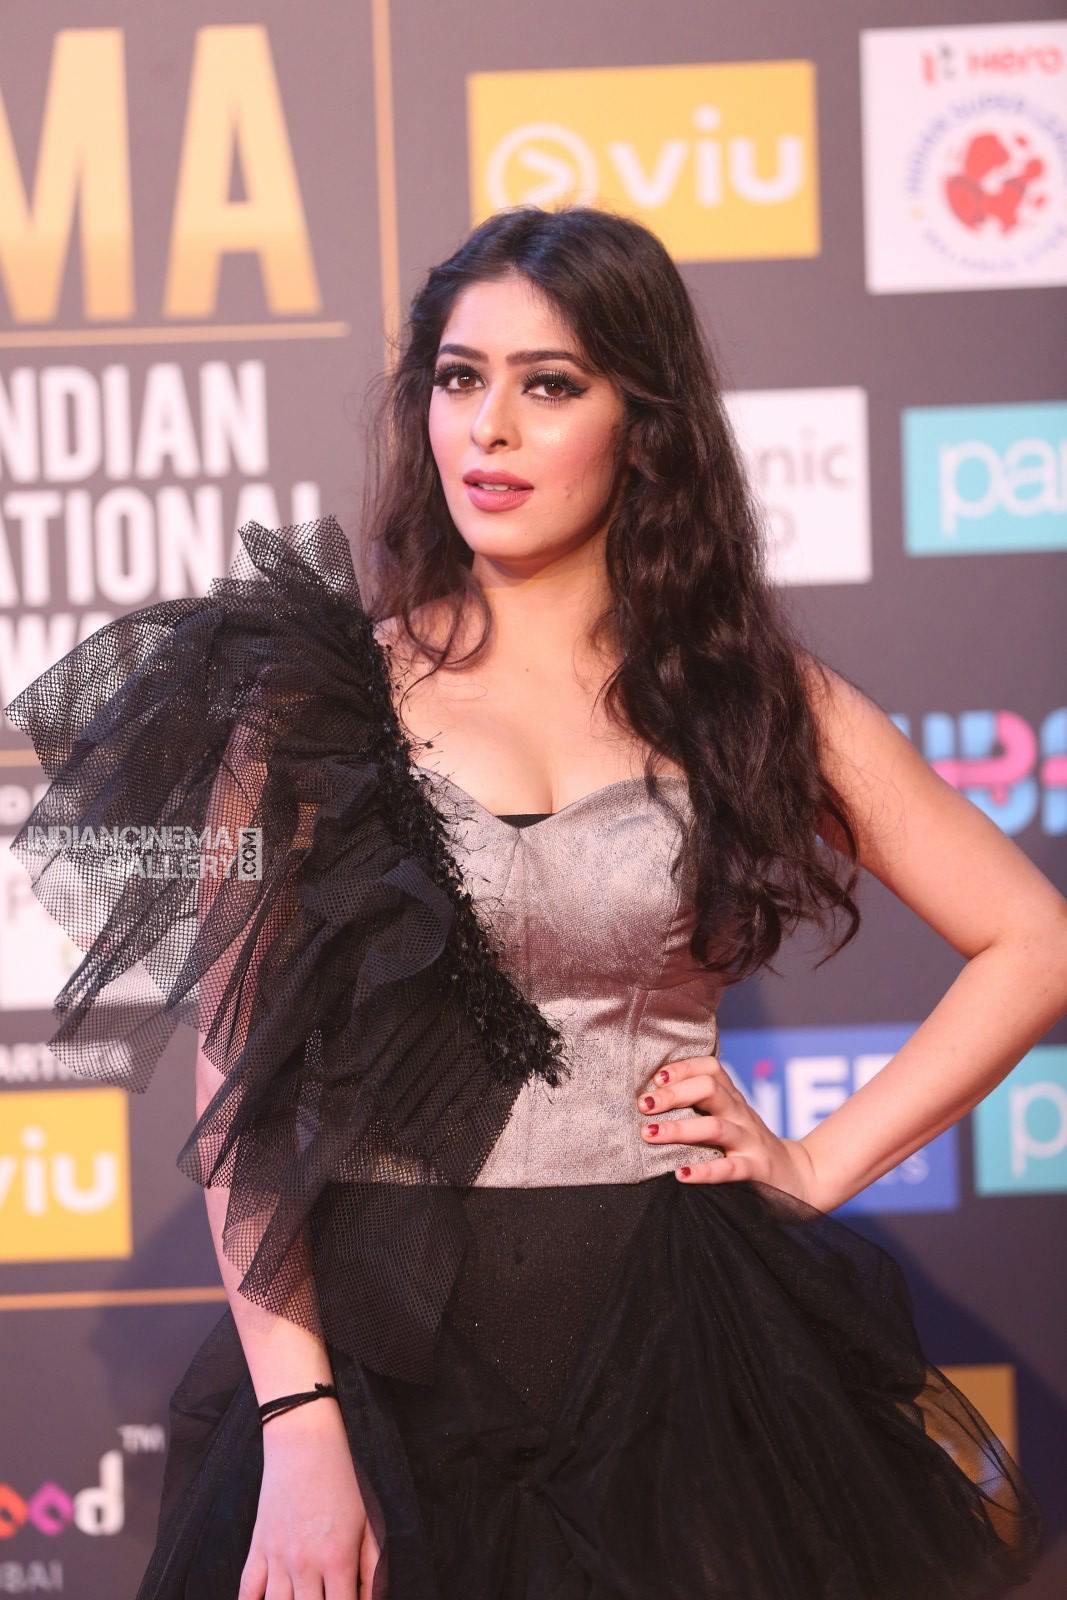 Garima Jain at SIIMA awards 2018 3